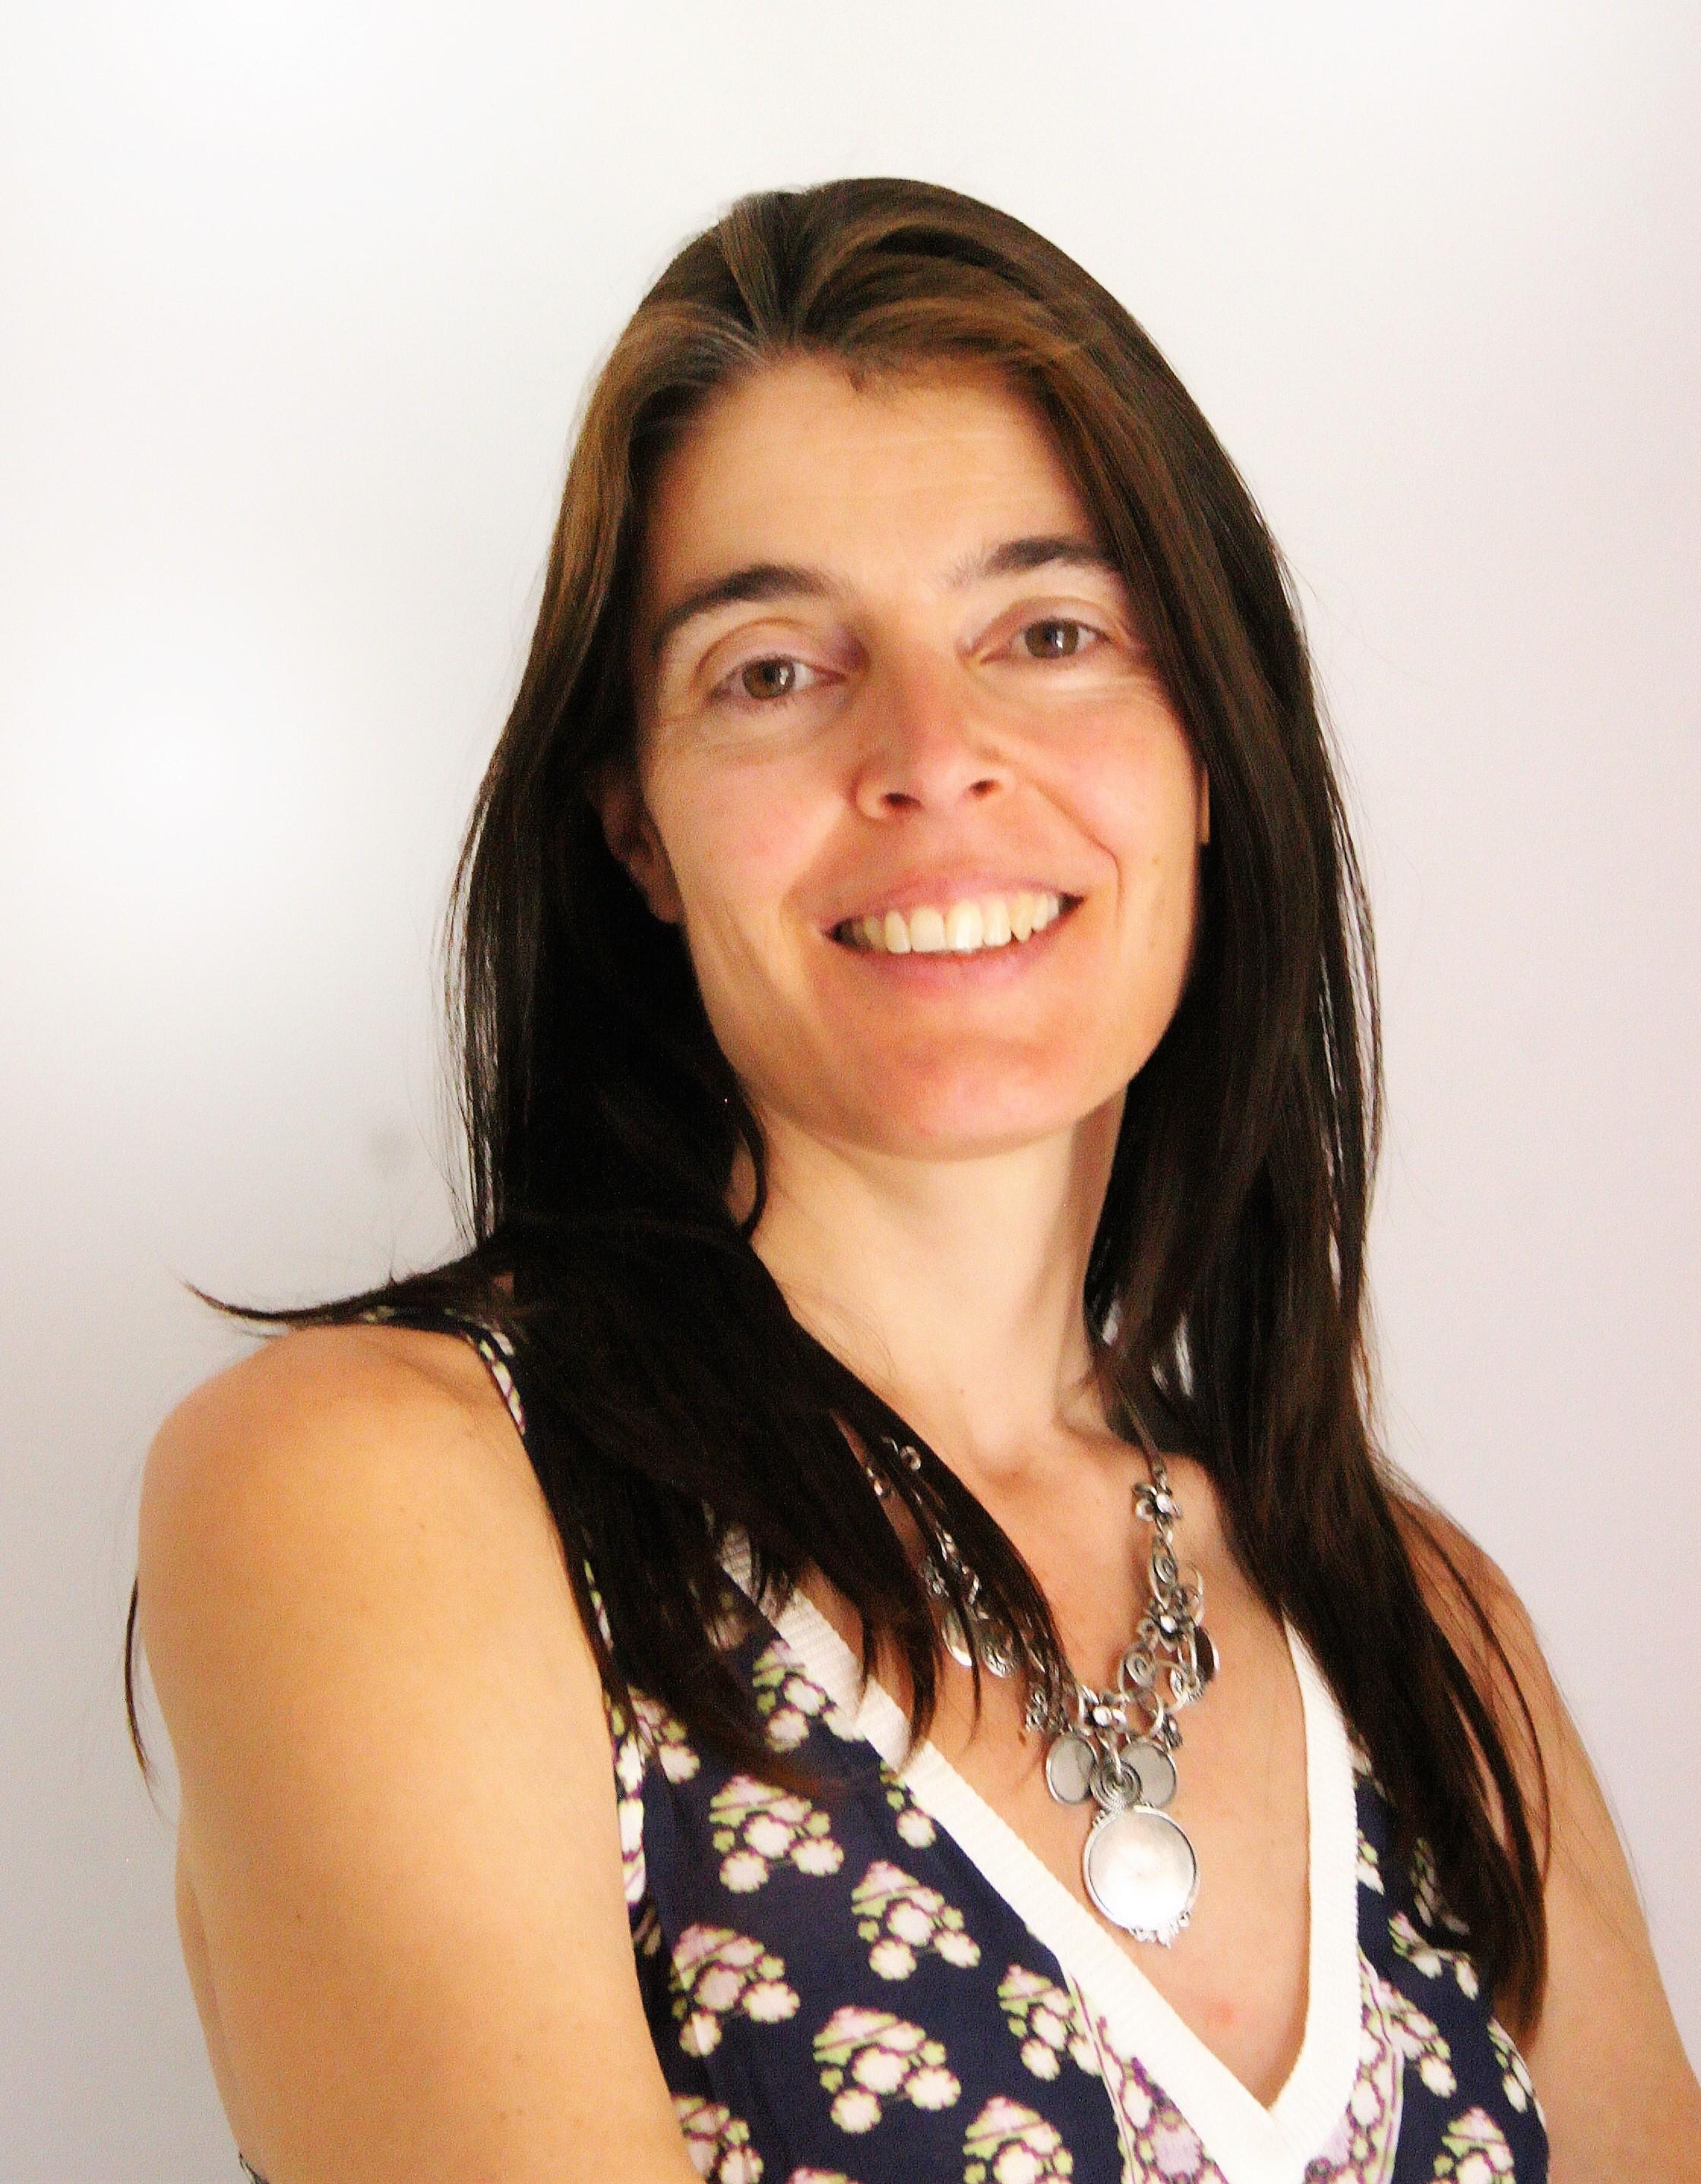 Carolina Costantino